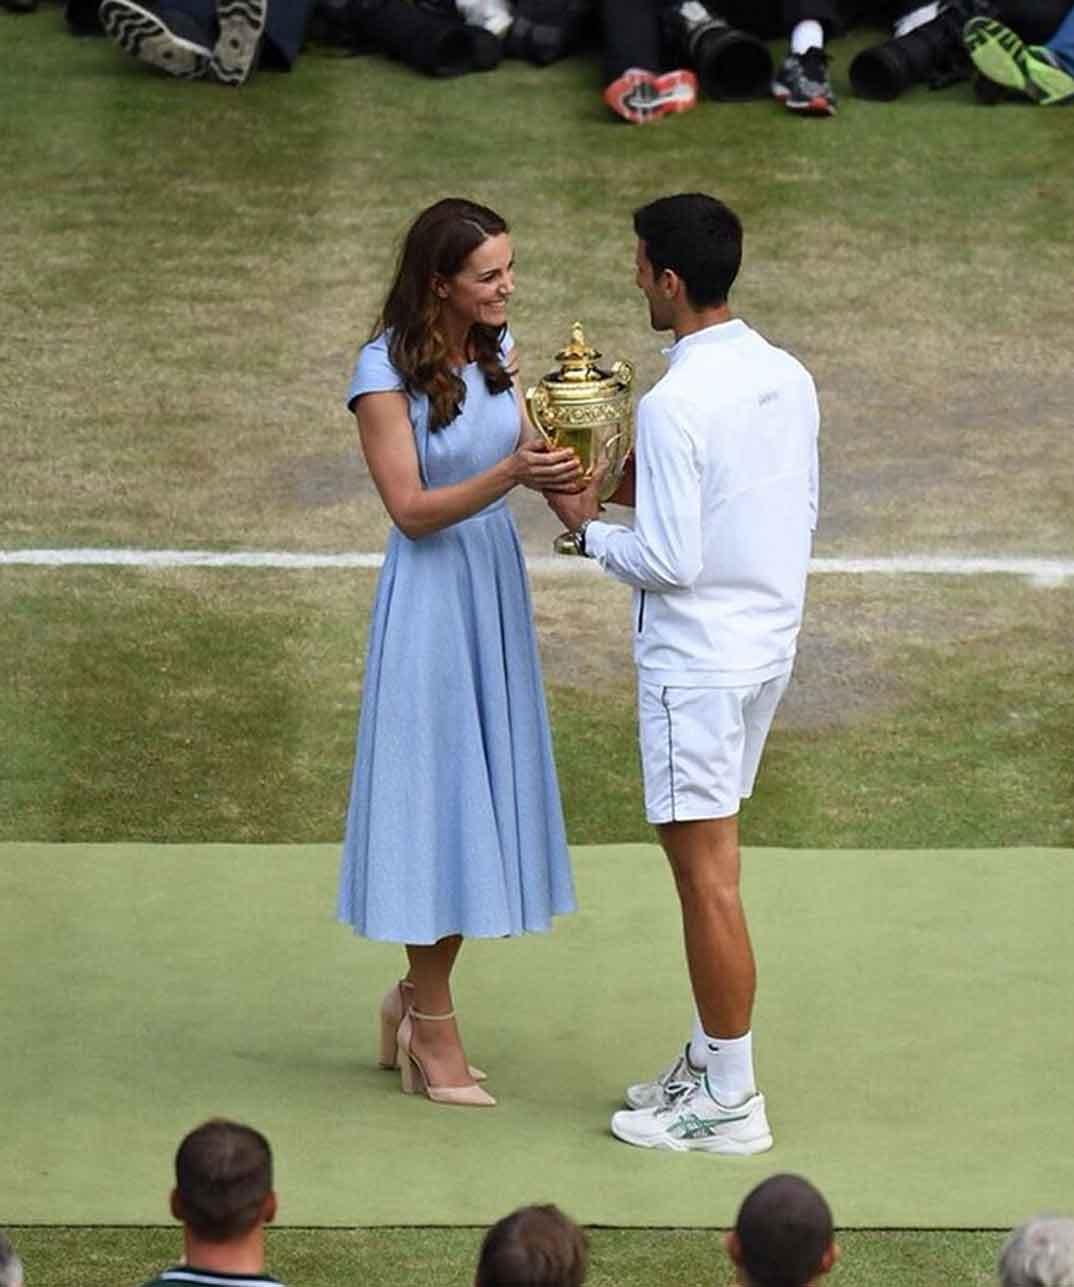 Duquesa de Cambridge Wimbledon © kesingtonroyal/Instagram